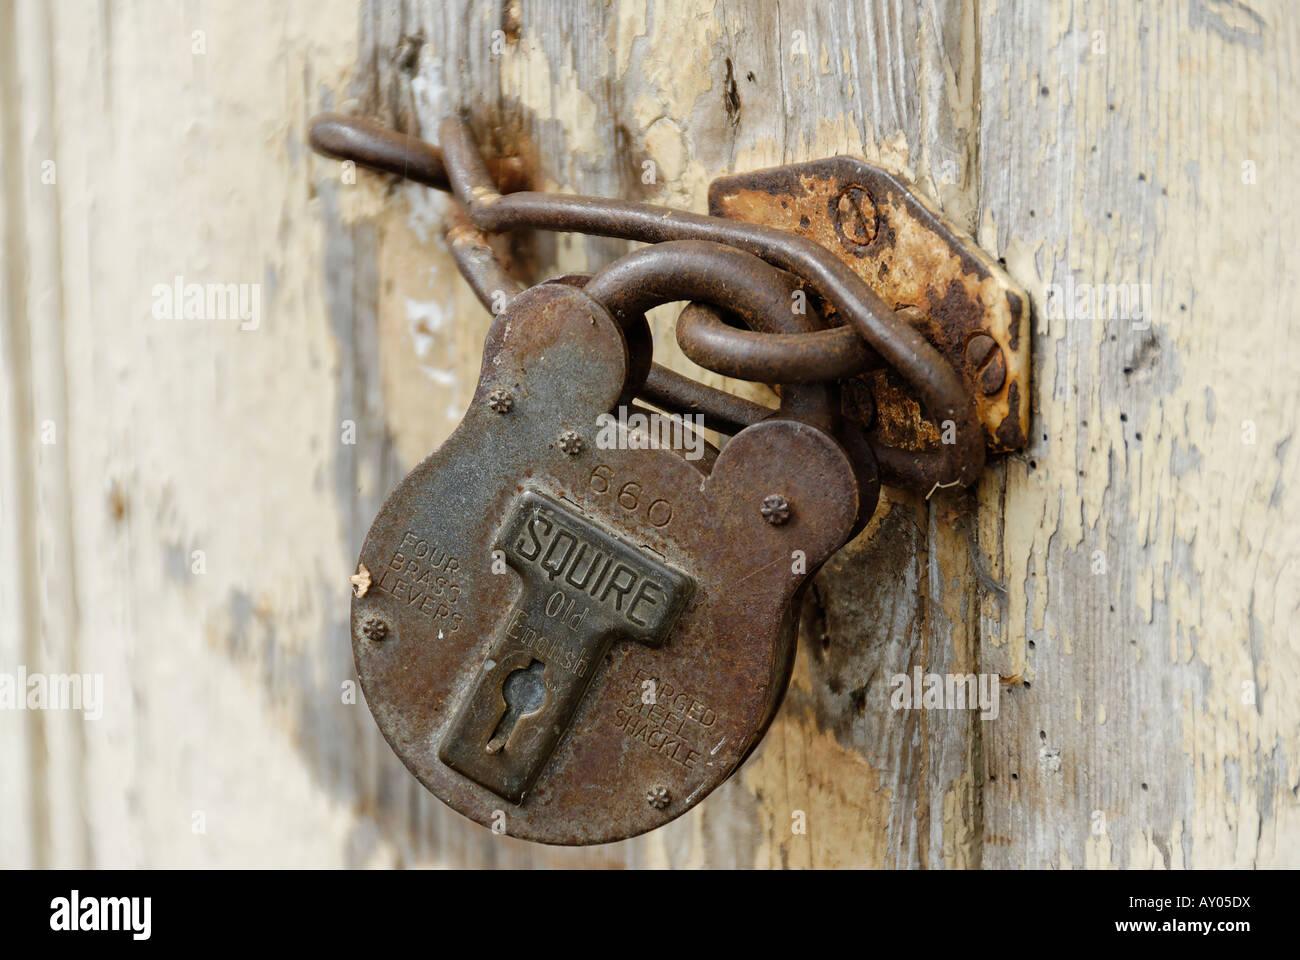 Rusting padlock - Stock Image